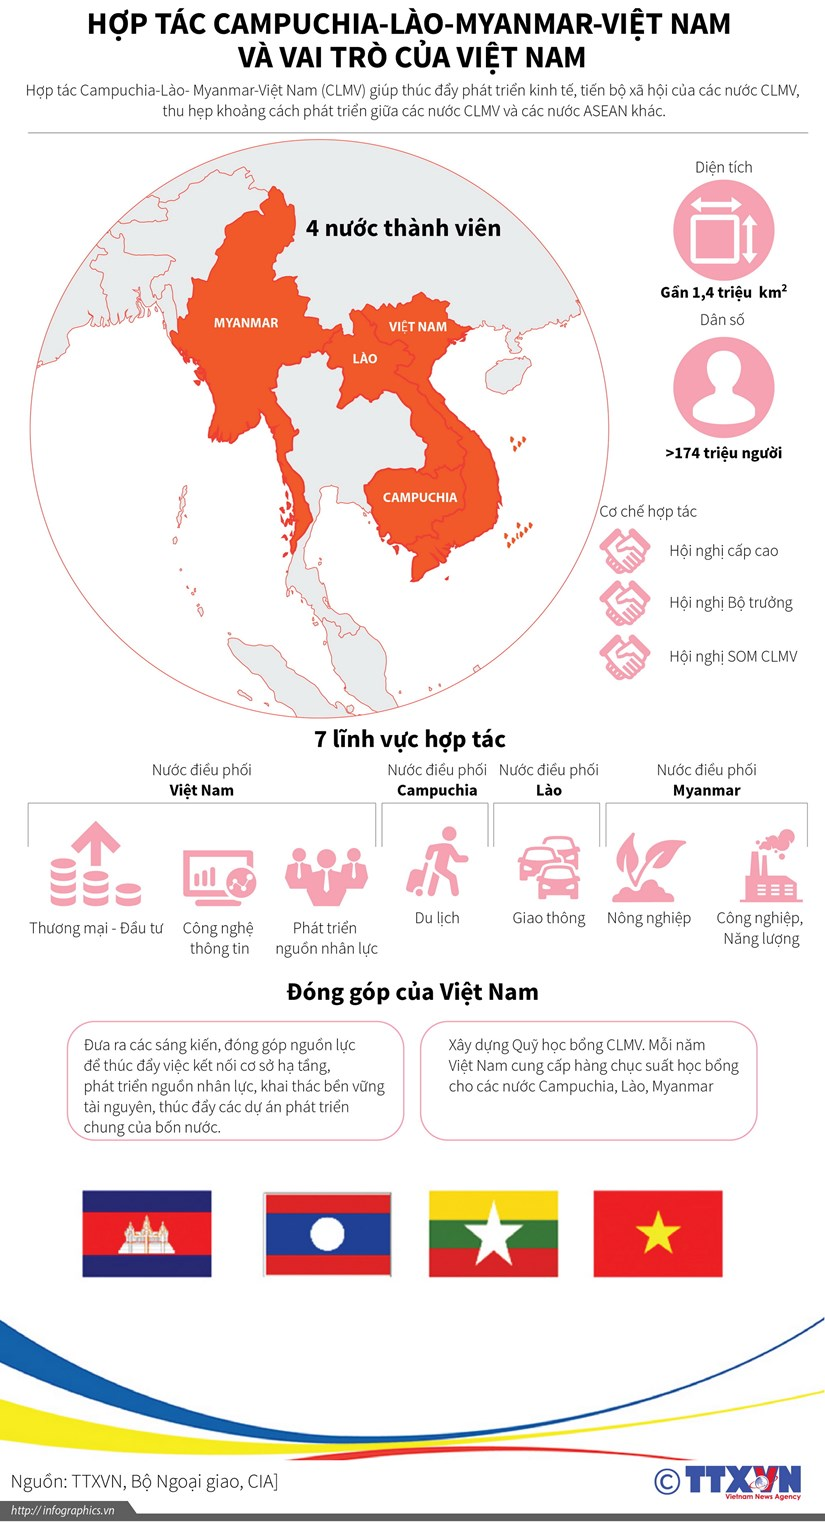 [Infographics] Hop tac CLMV va vai tro cua Viet Nam hinh anh 1